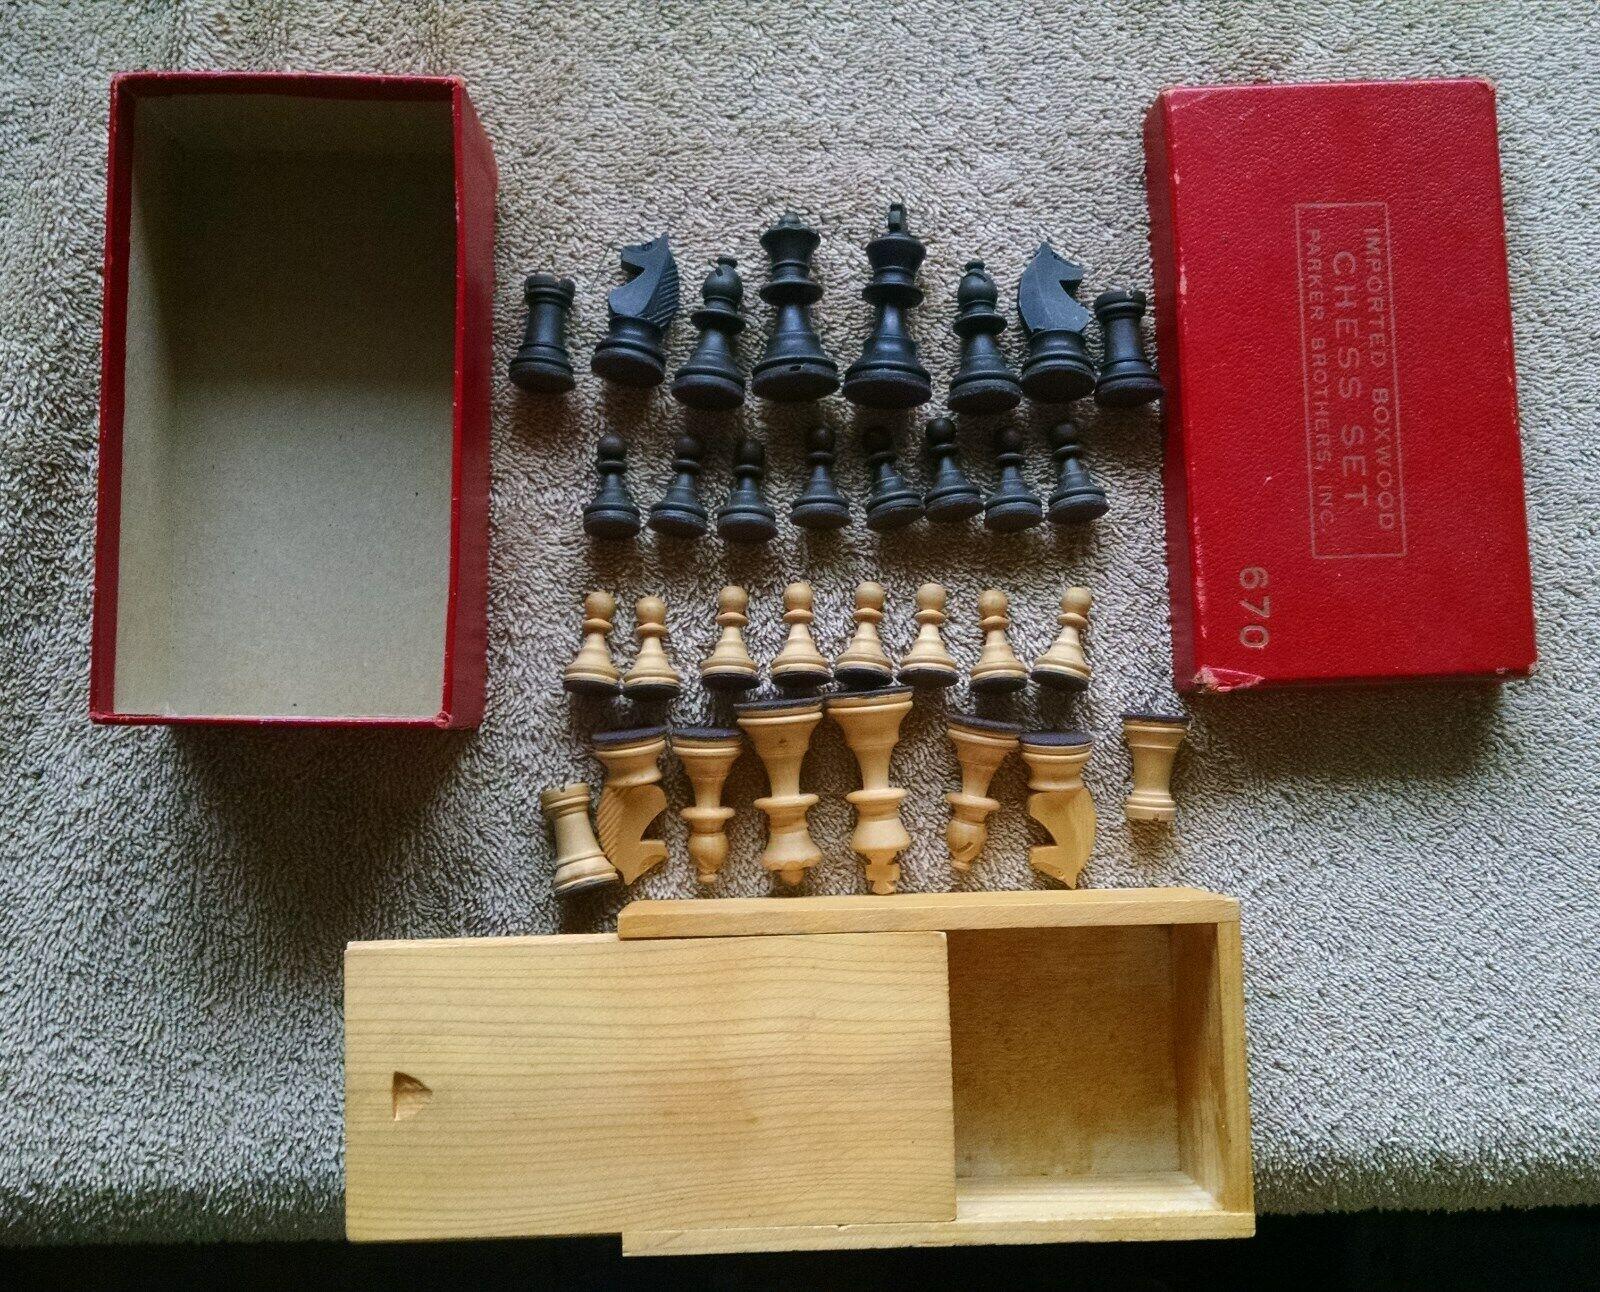 Importés buis Chess Set Parker Brougehers 670 inner & Outer Box 2 1 8 King très bon +